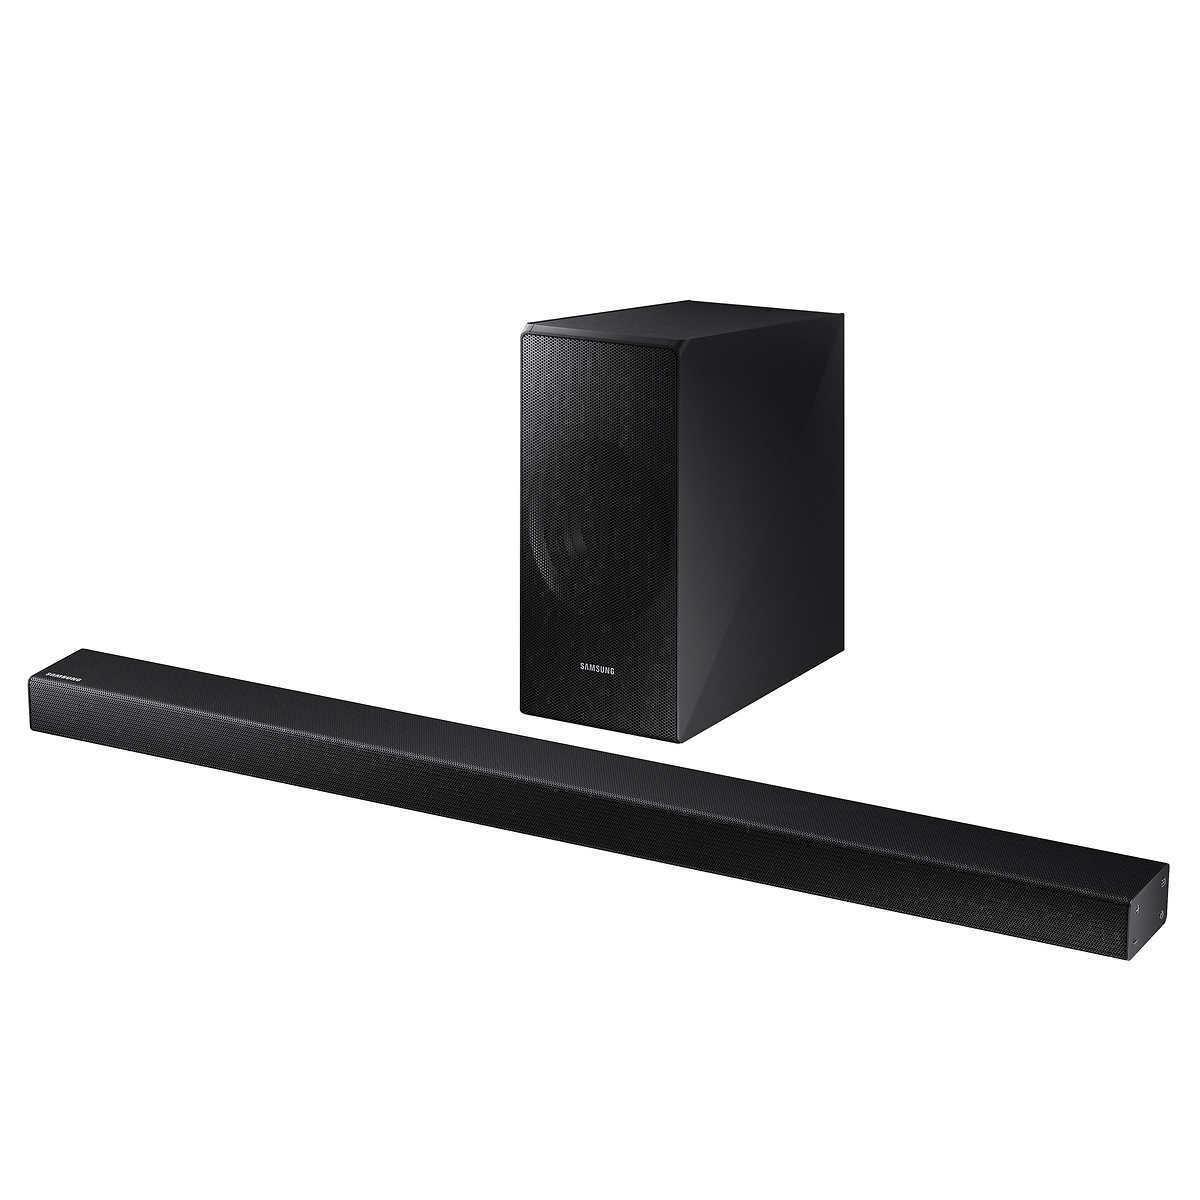 Samsung HW-MM55C ZAR 3.1 340W Channel Soundbar - Certified Refurbished